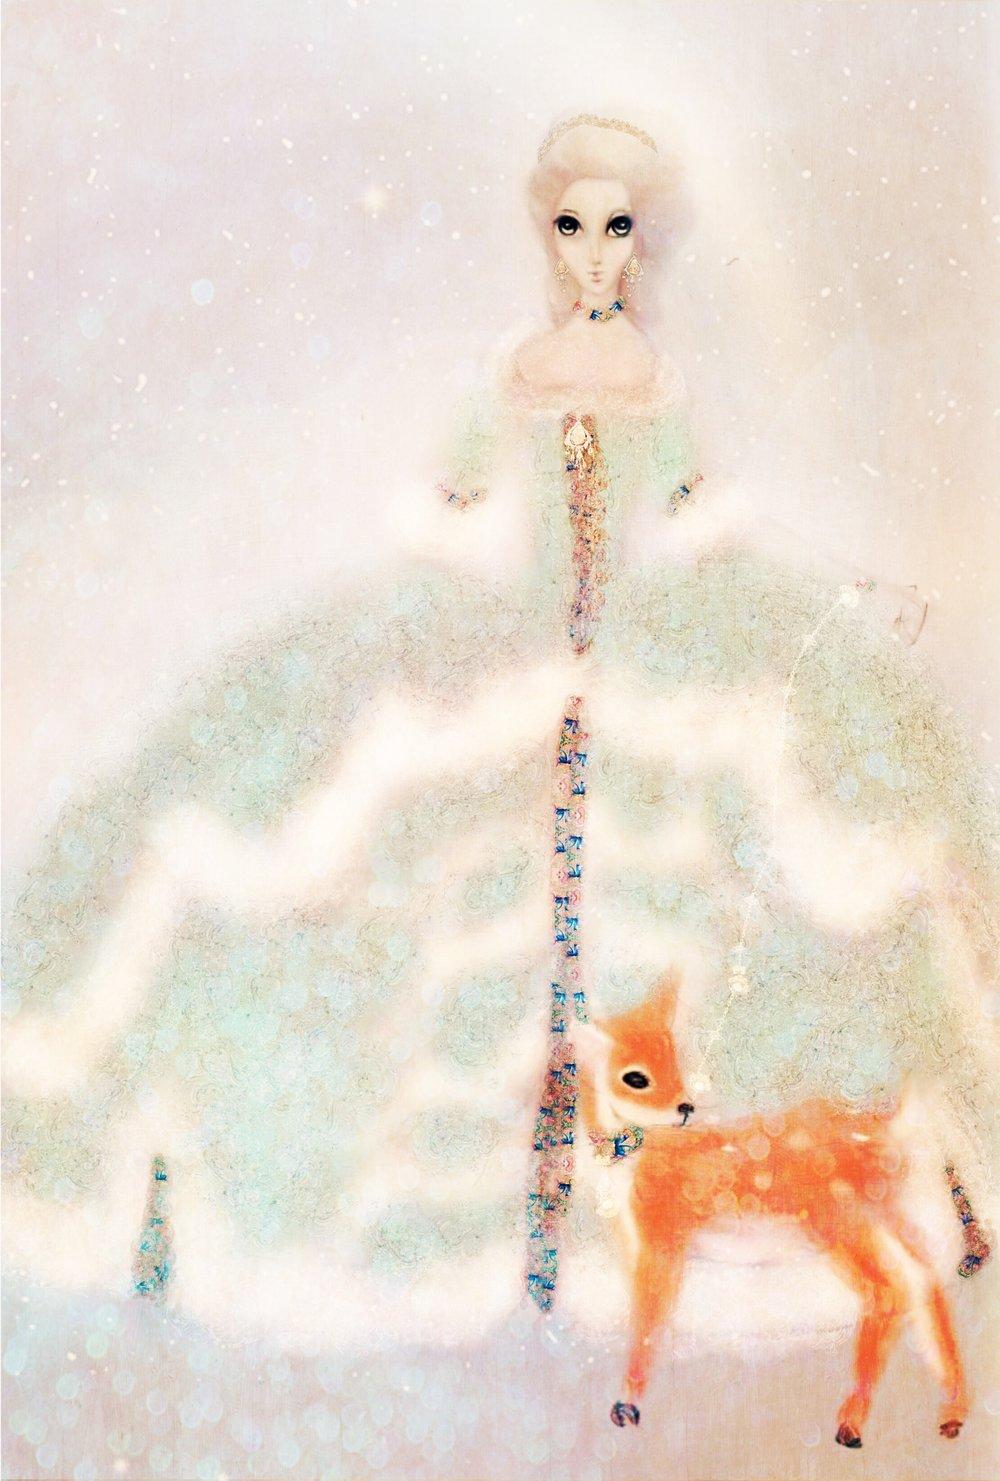 winter-fairy-fawn-illustration.JPG